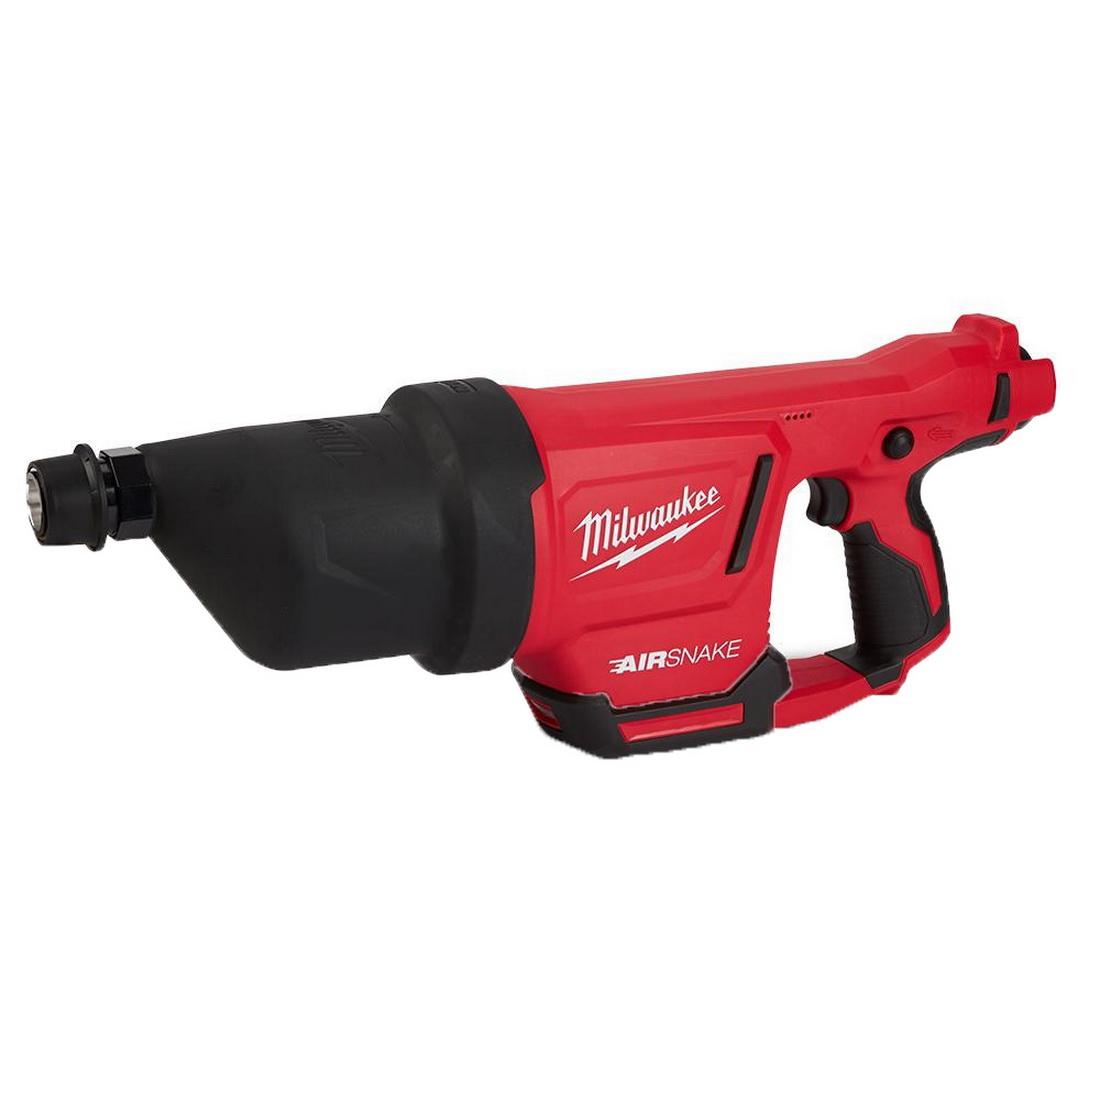 M12 AIRSNAKE Drain Cleaning Air Gun (Tool Only)